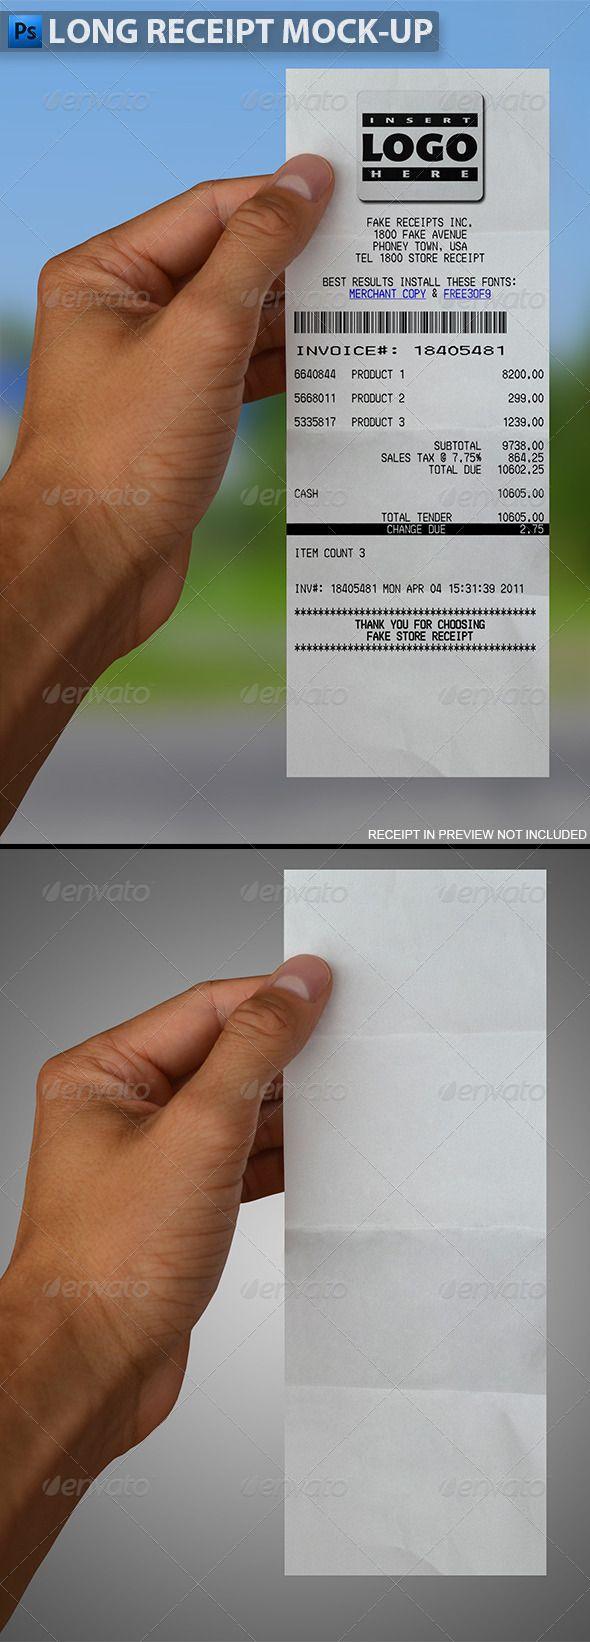 Long Receipt In Hand Mock Up Print Mockup Mockup Receipt Template